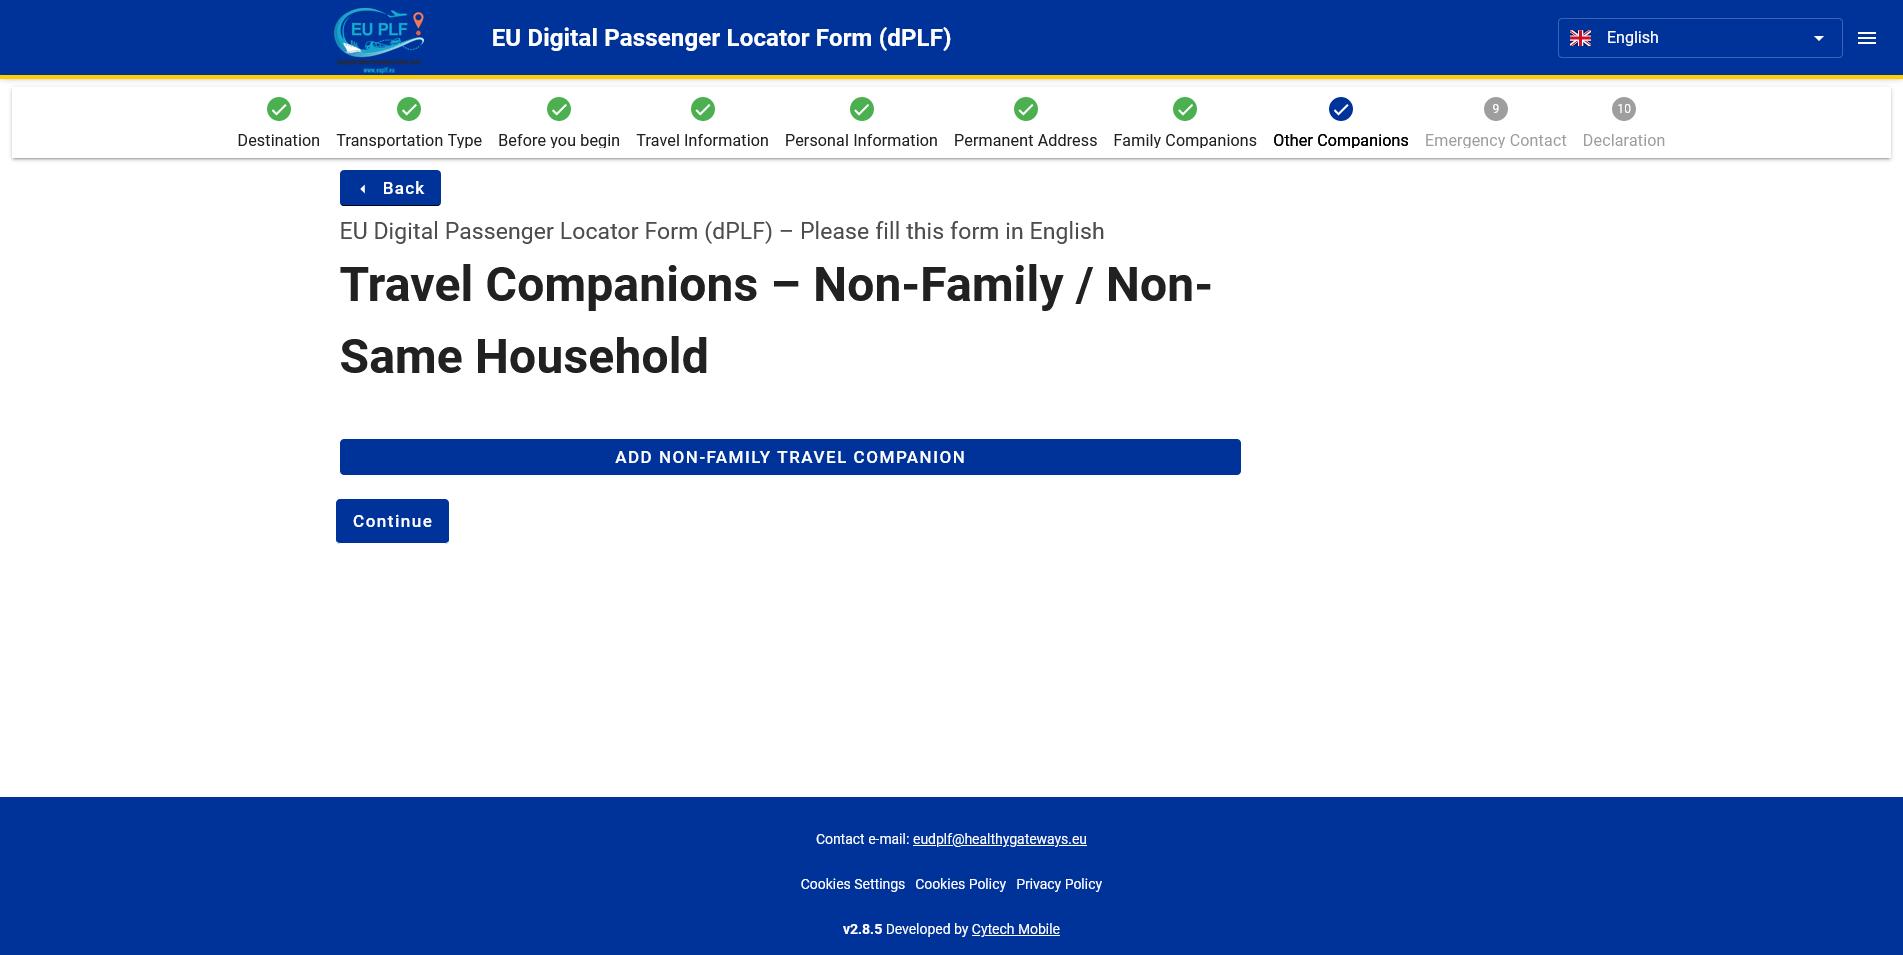 8 Non Family Companions